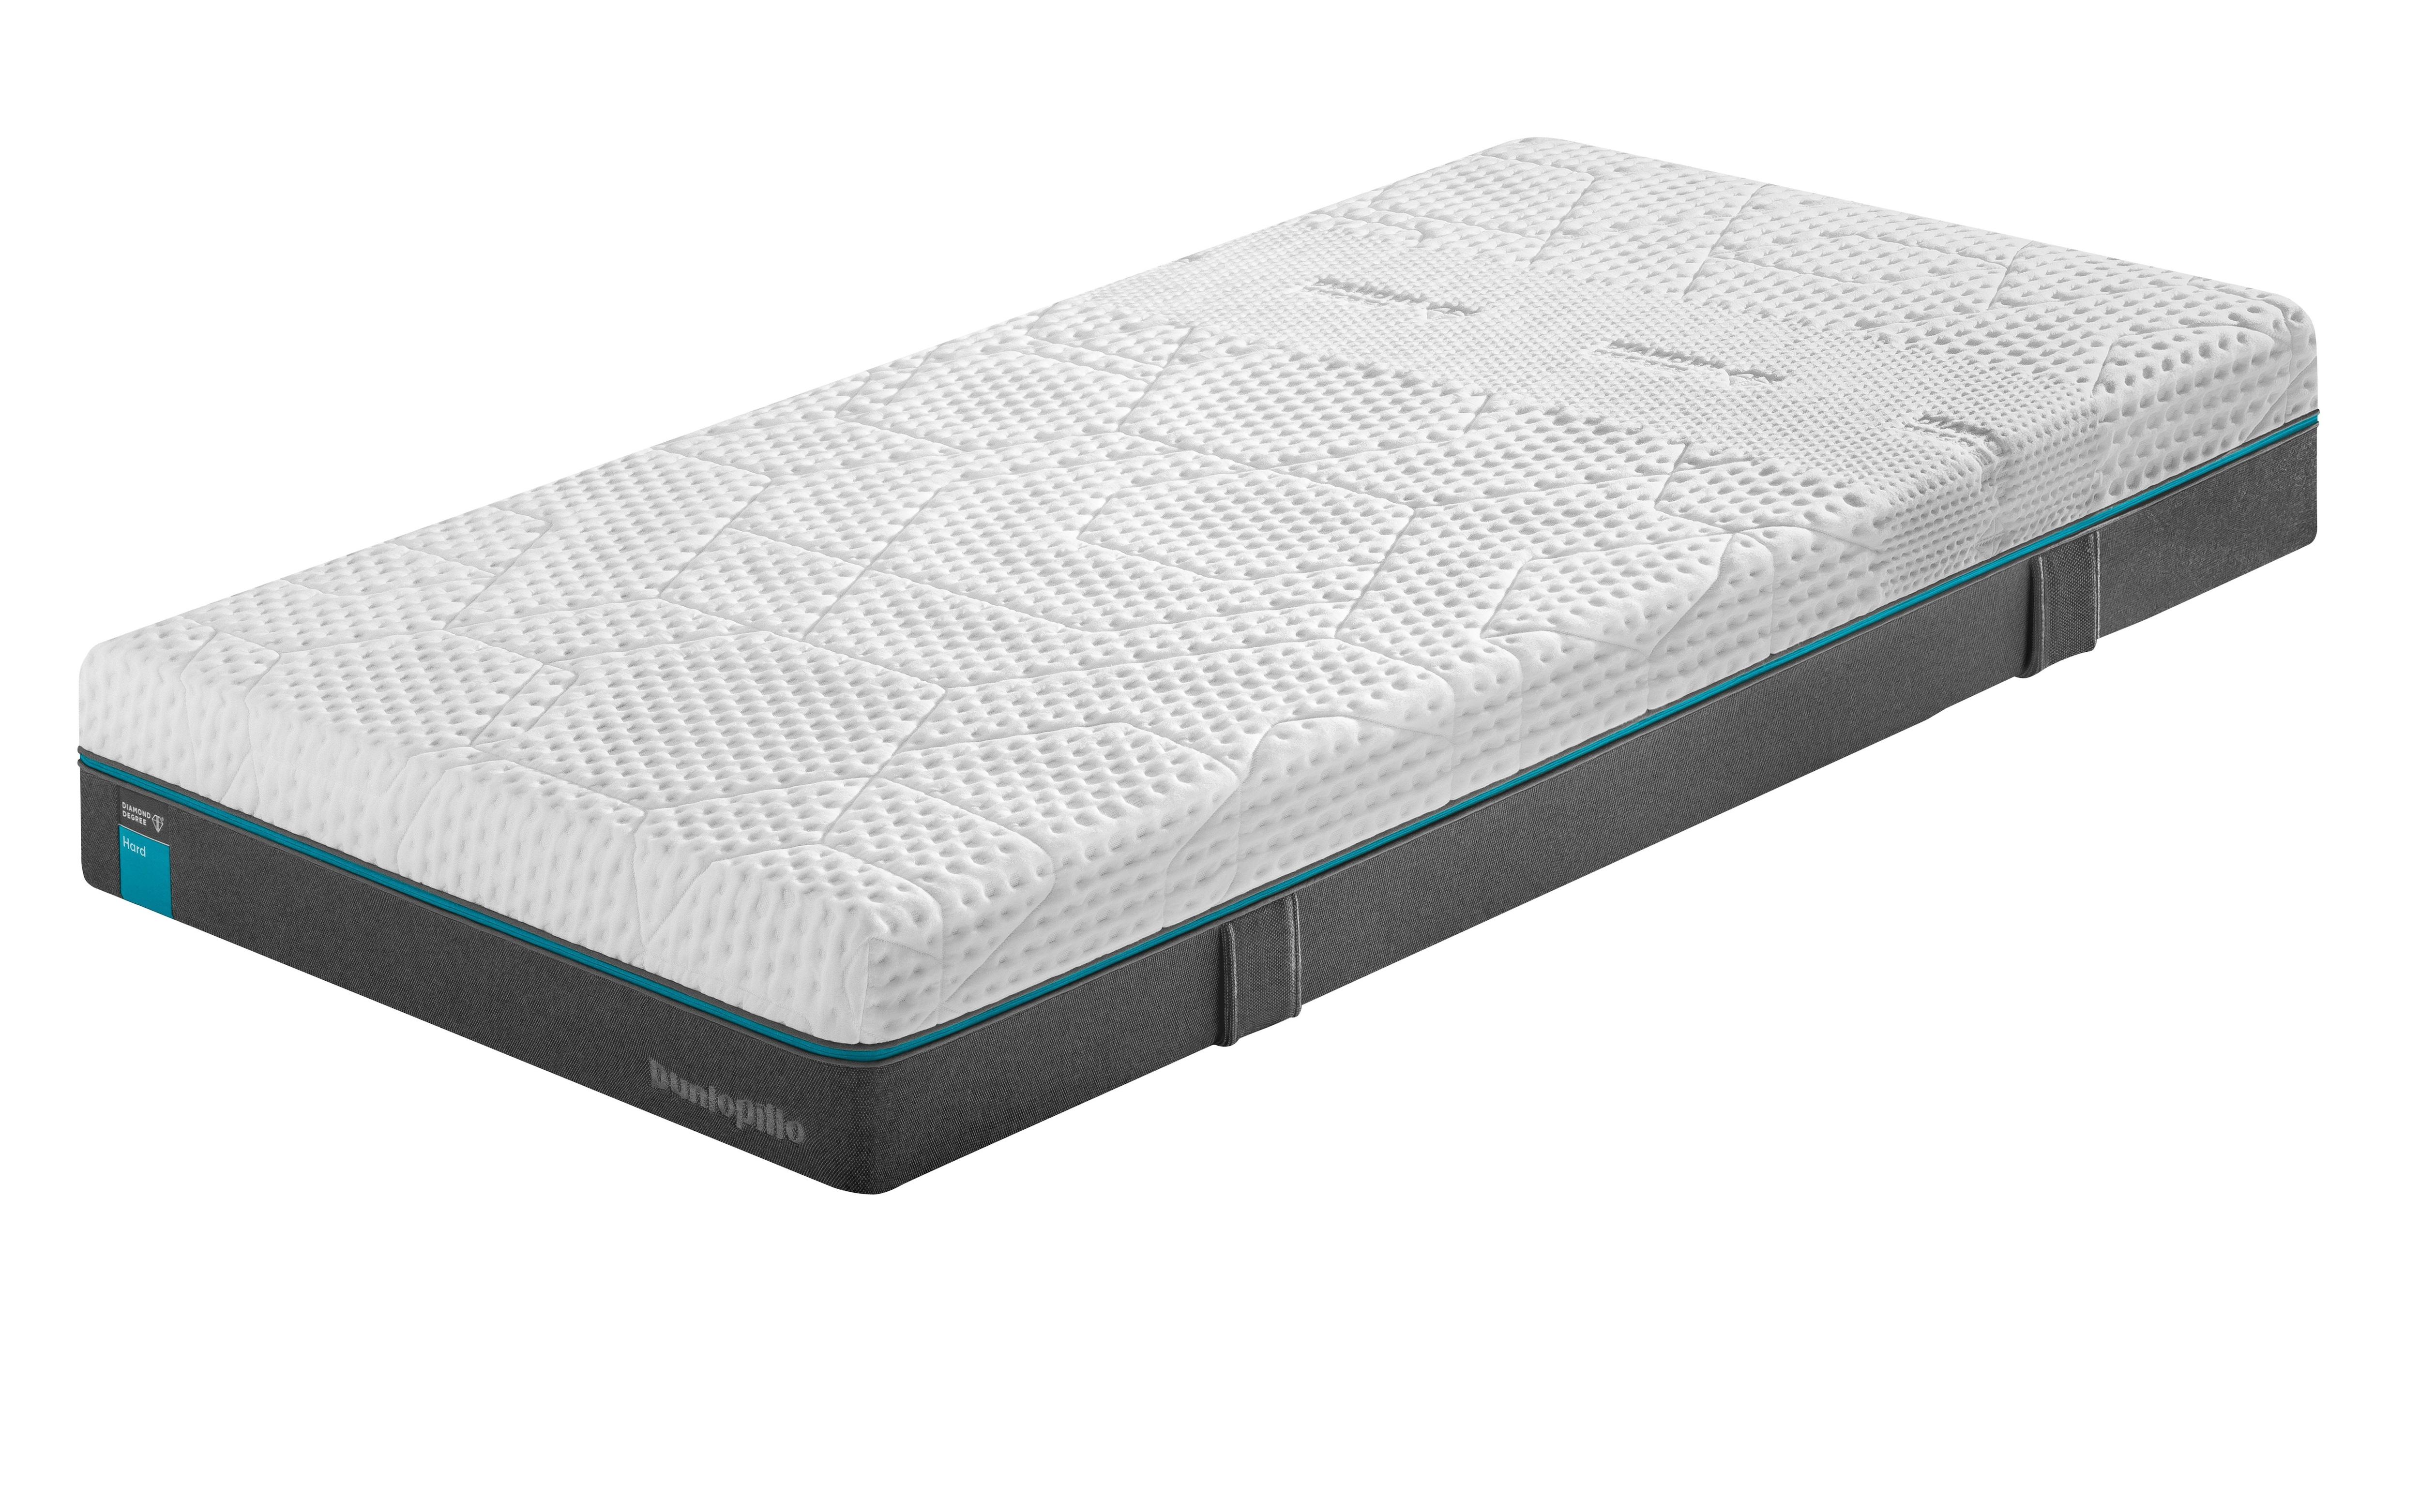 Kaltschaummatratze Diamond Degree Hard Dunlopillo 25 cm hoch